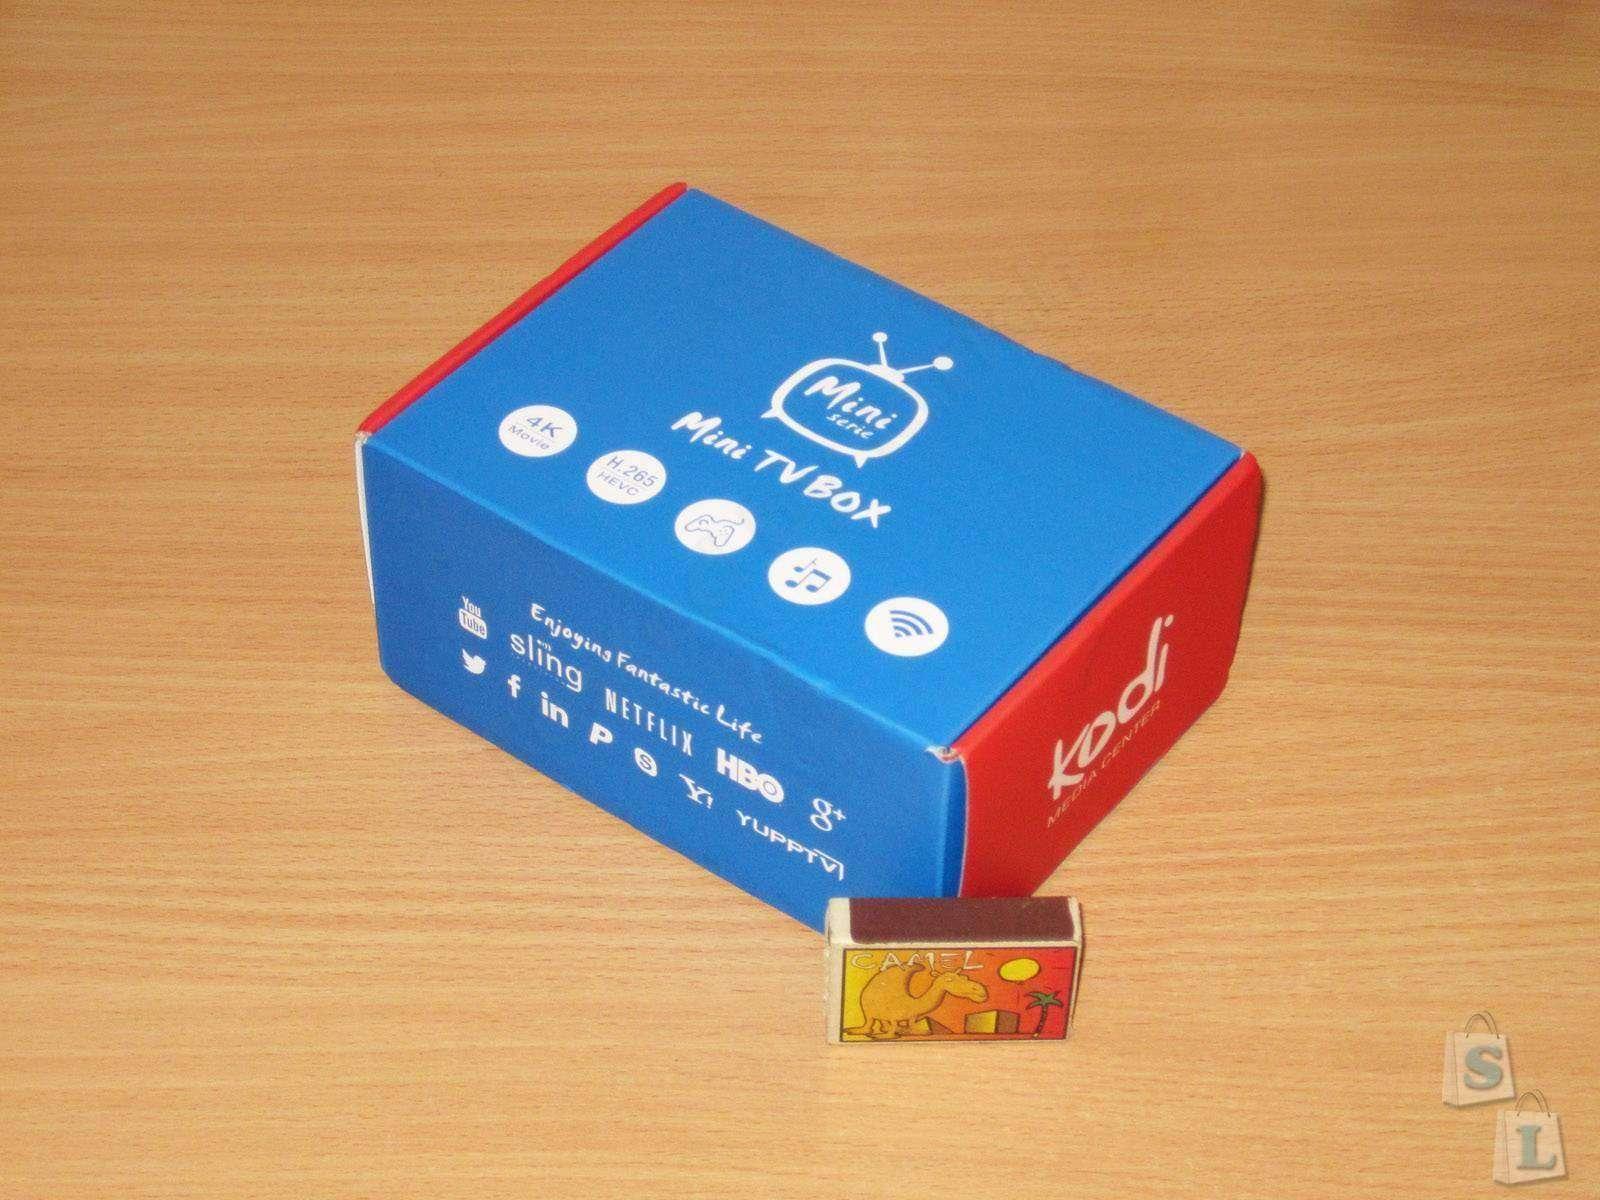 GearBest: Mini M8S, неплохой маленький ТВ бокс на Amlogic S905